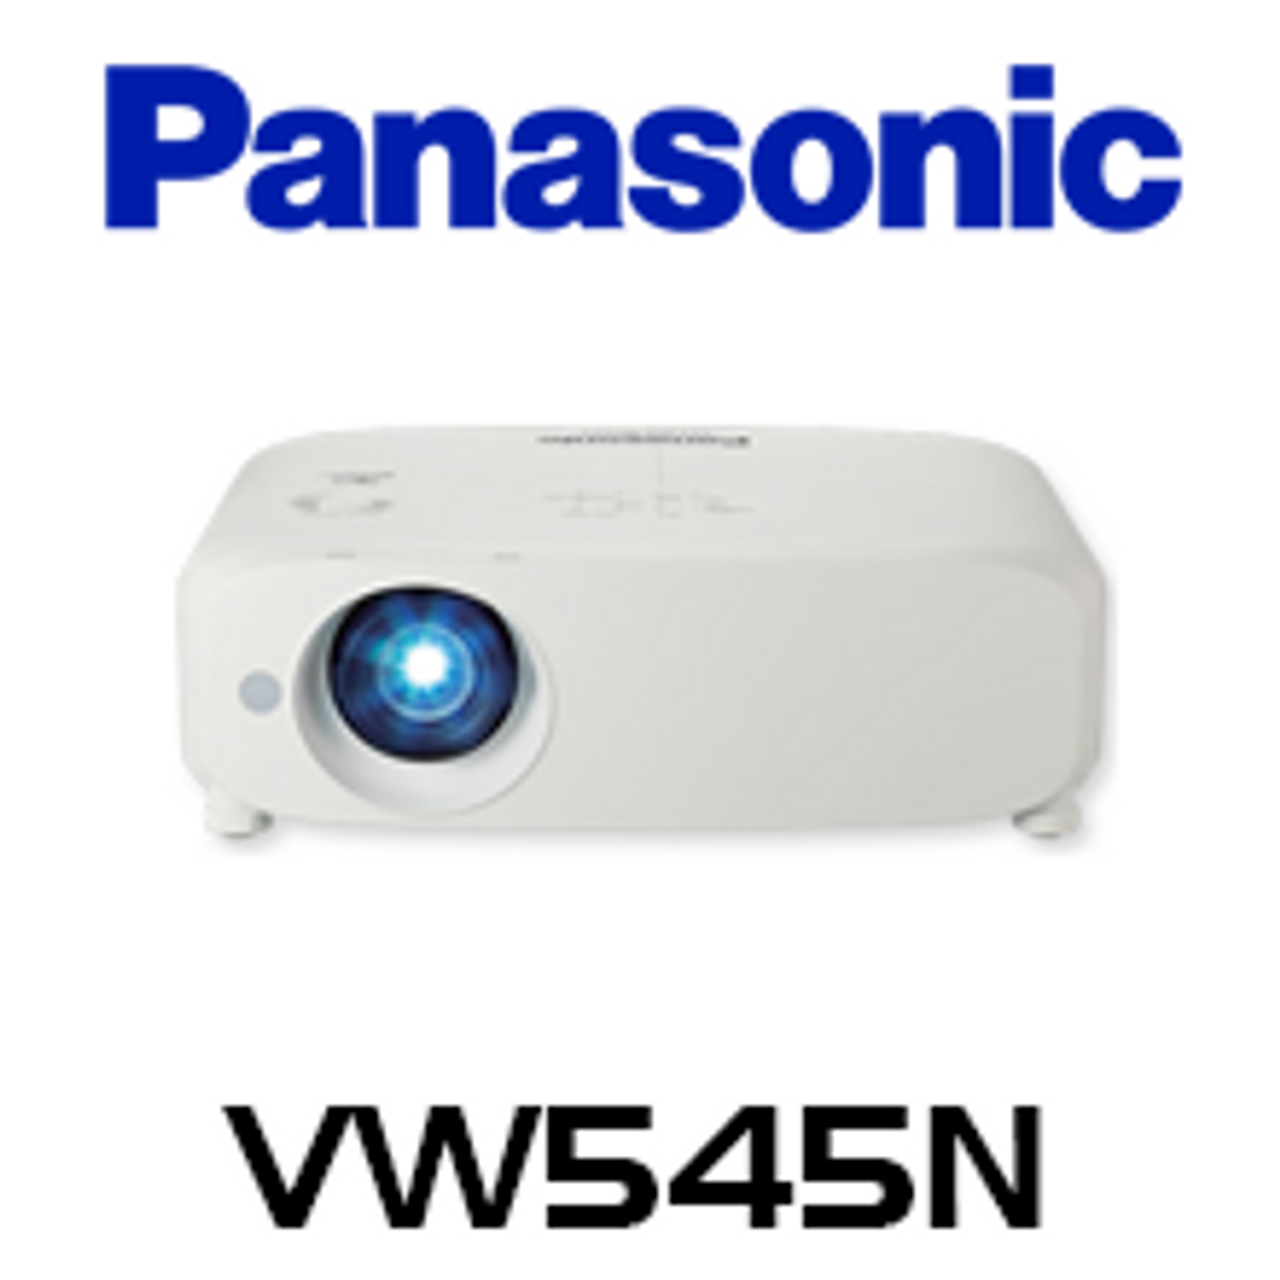 Panasonic PT-VW545N WXGA 5500 Lumens Digital Link Wireless Portable LCD  Projector 6ec4828a887f